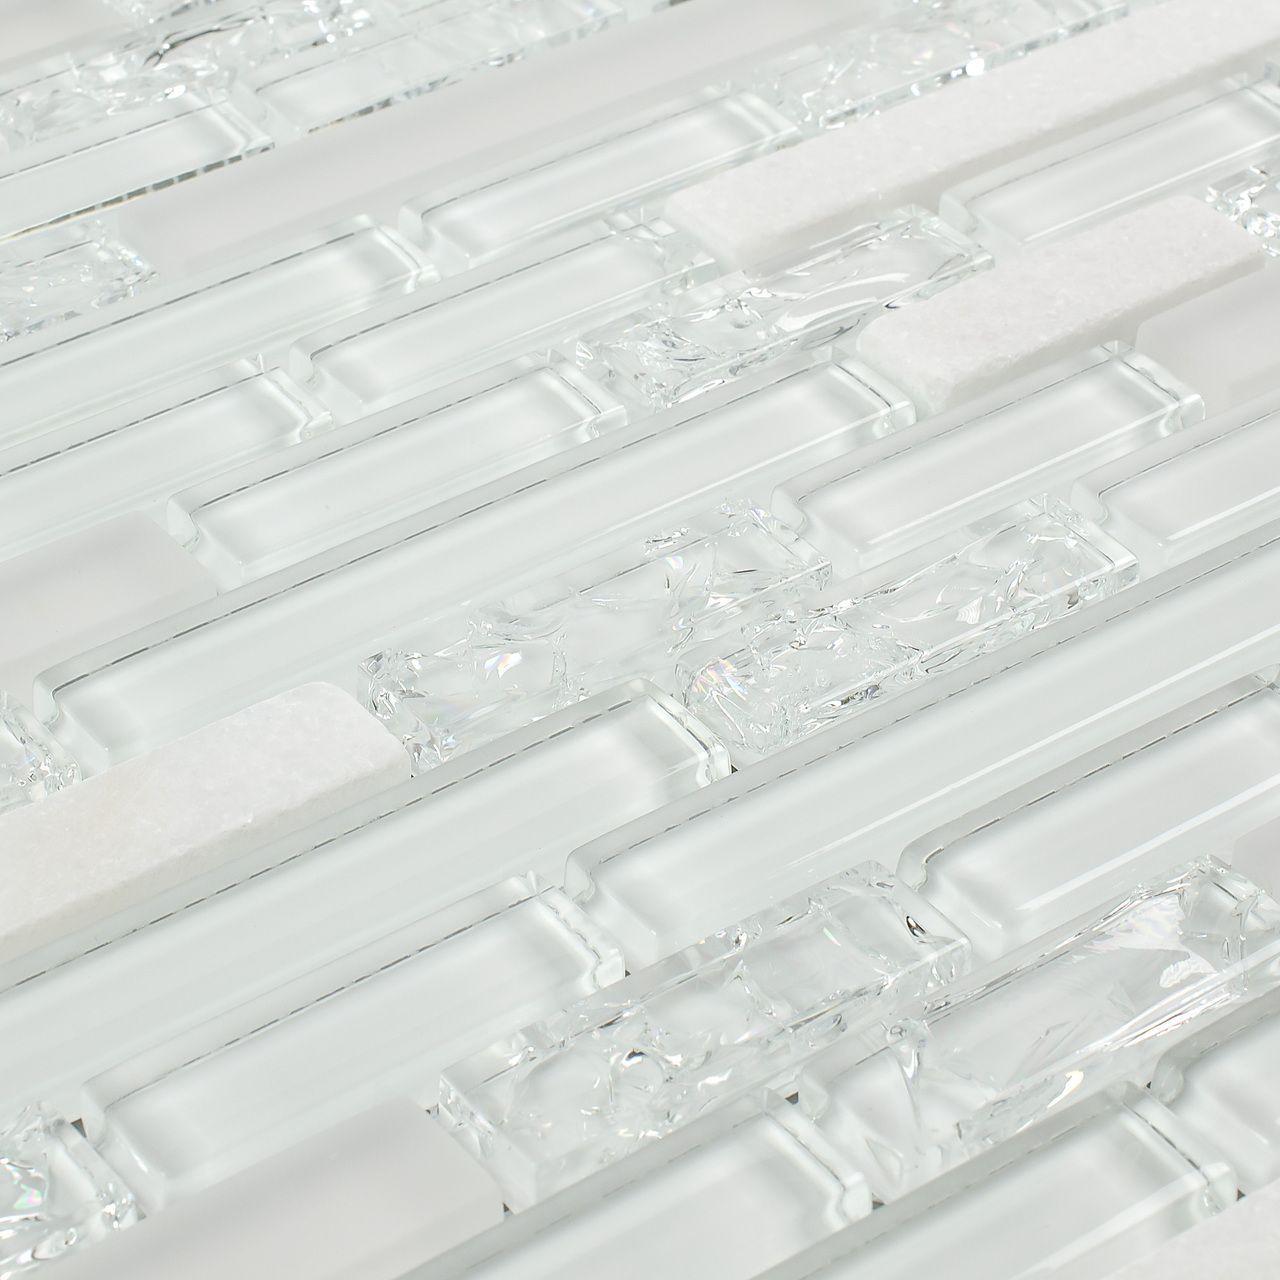 Linear Crackled Glass Tile Snow White White Glass Tile Glass